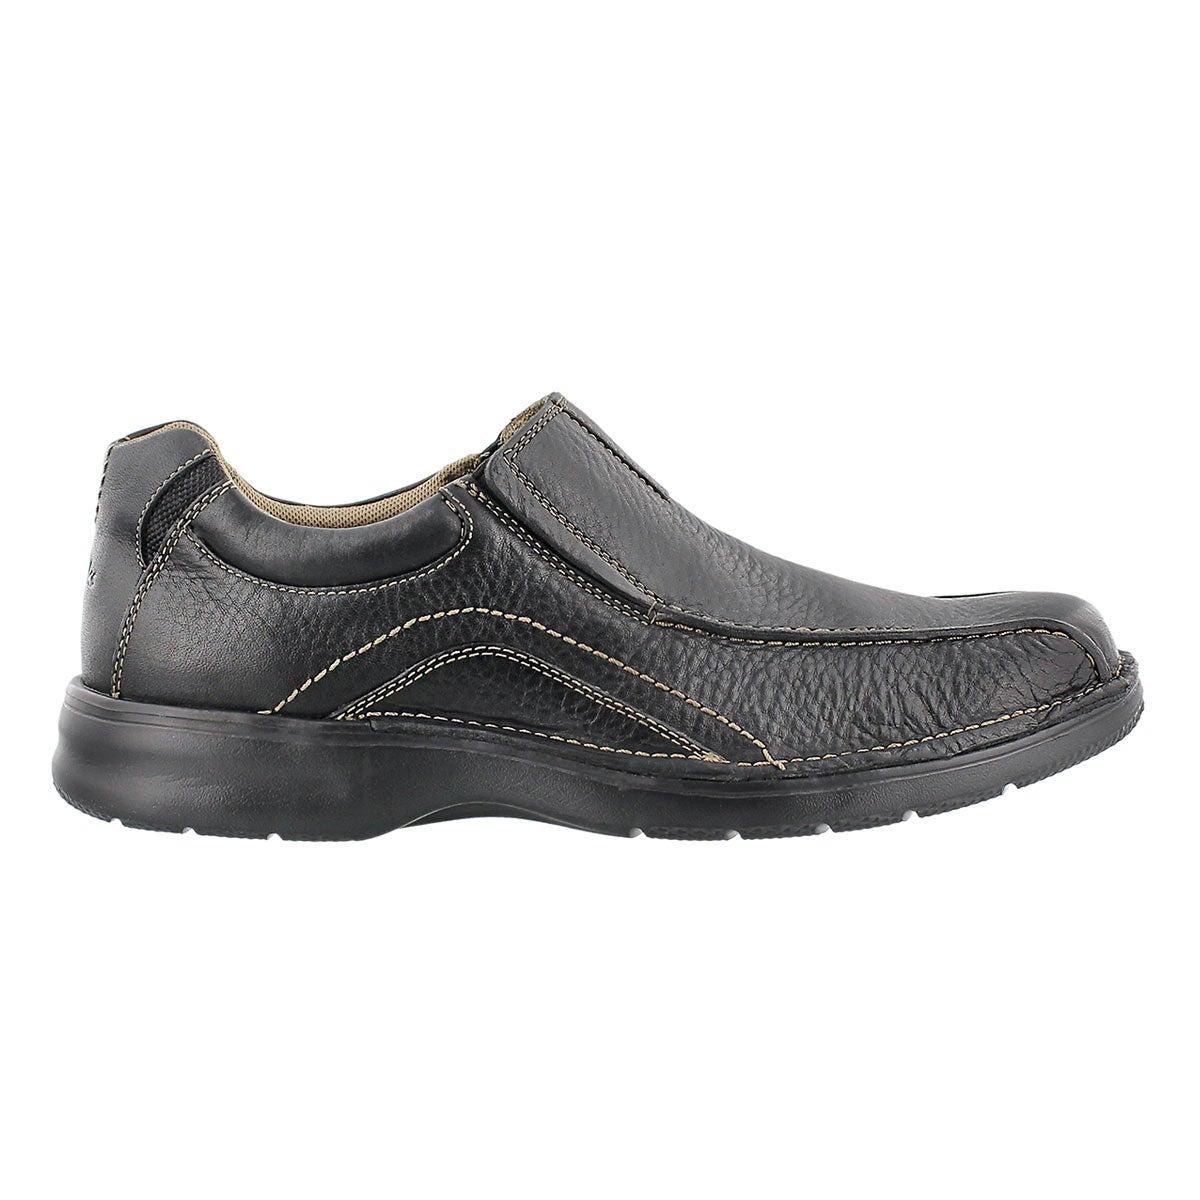 Mns Pickett black oily casual slip on